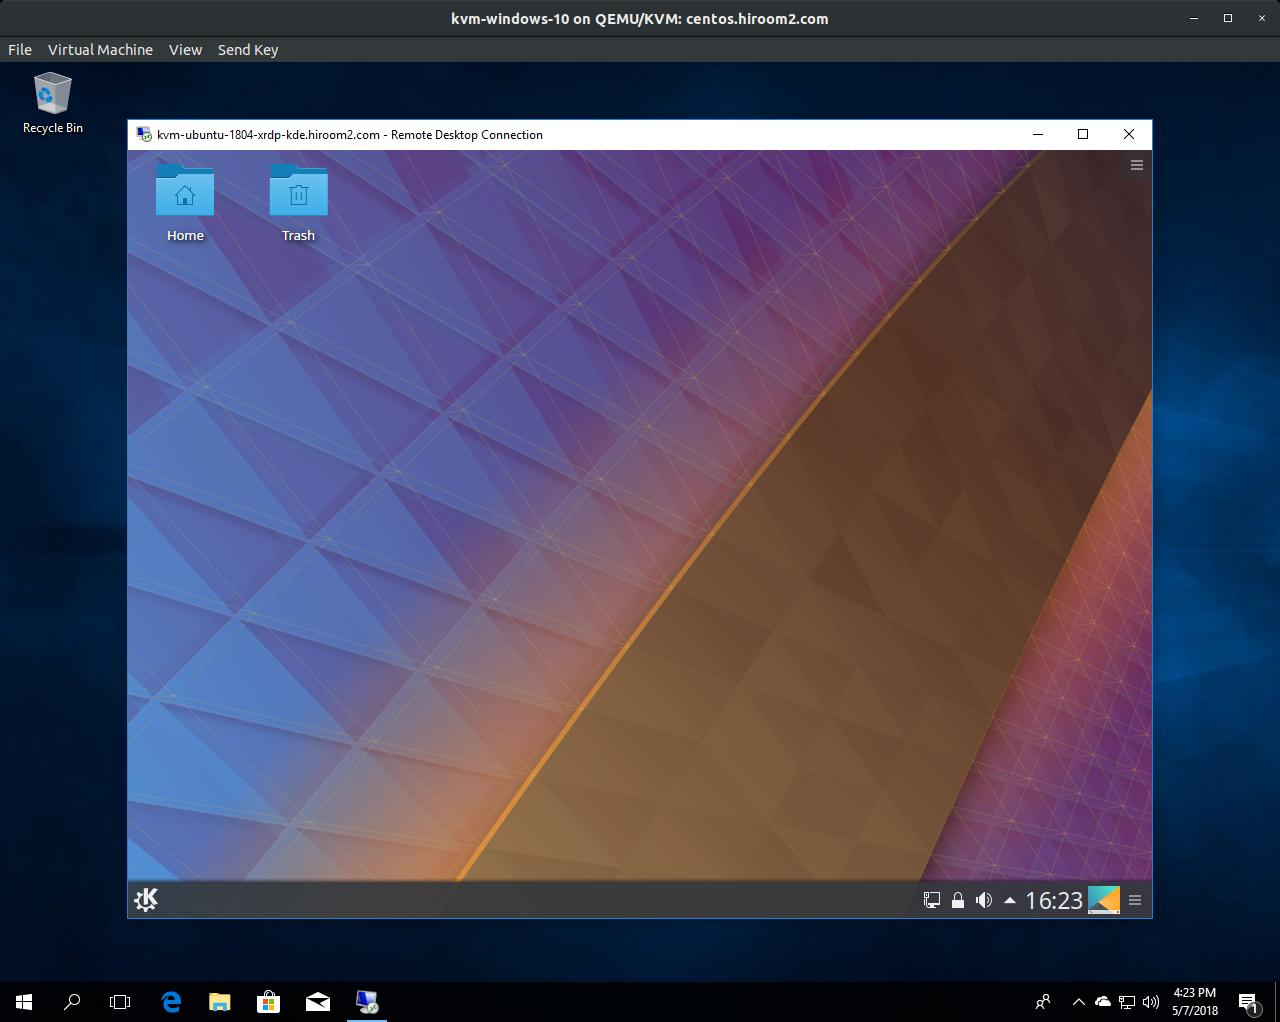 Ubuntu 18 04: Connect to KDE desktop environment via XRDP